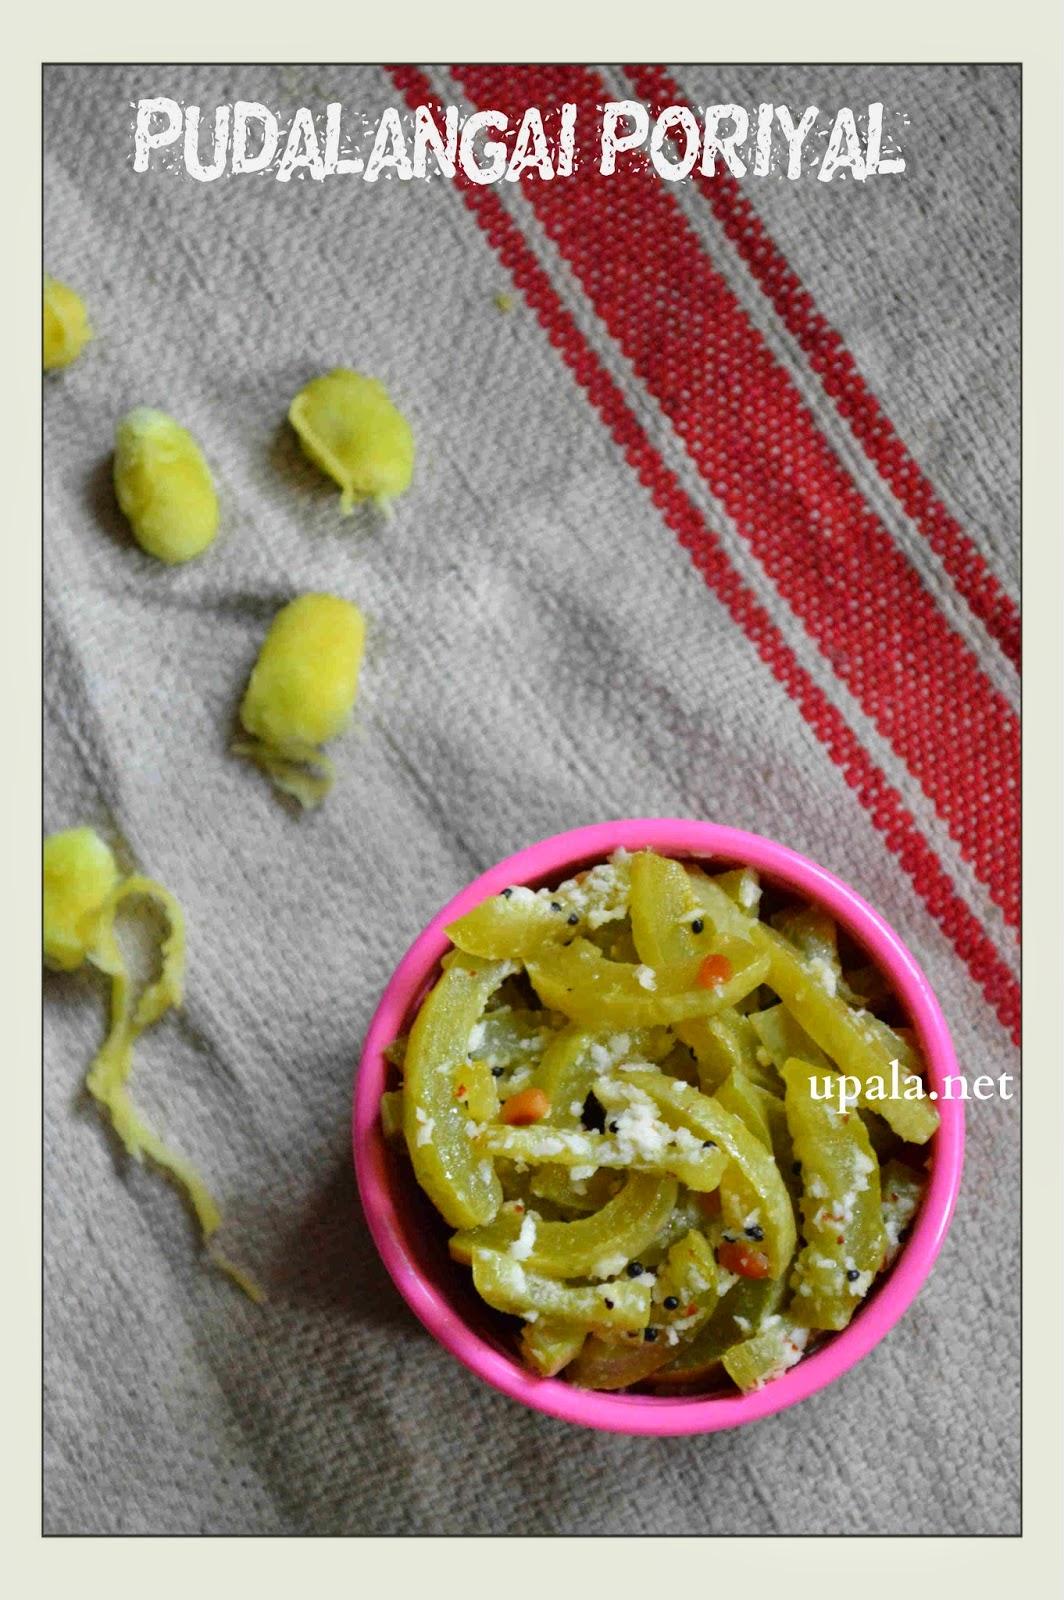 snake gourd stir fry/pudalangai poriyal